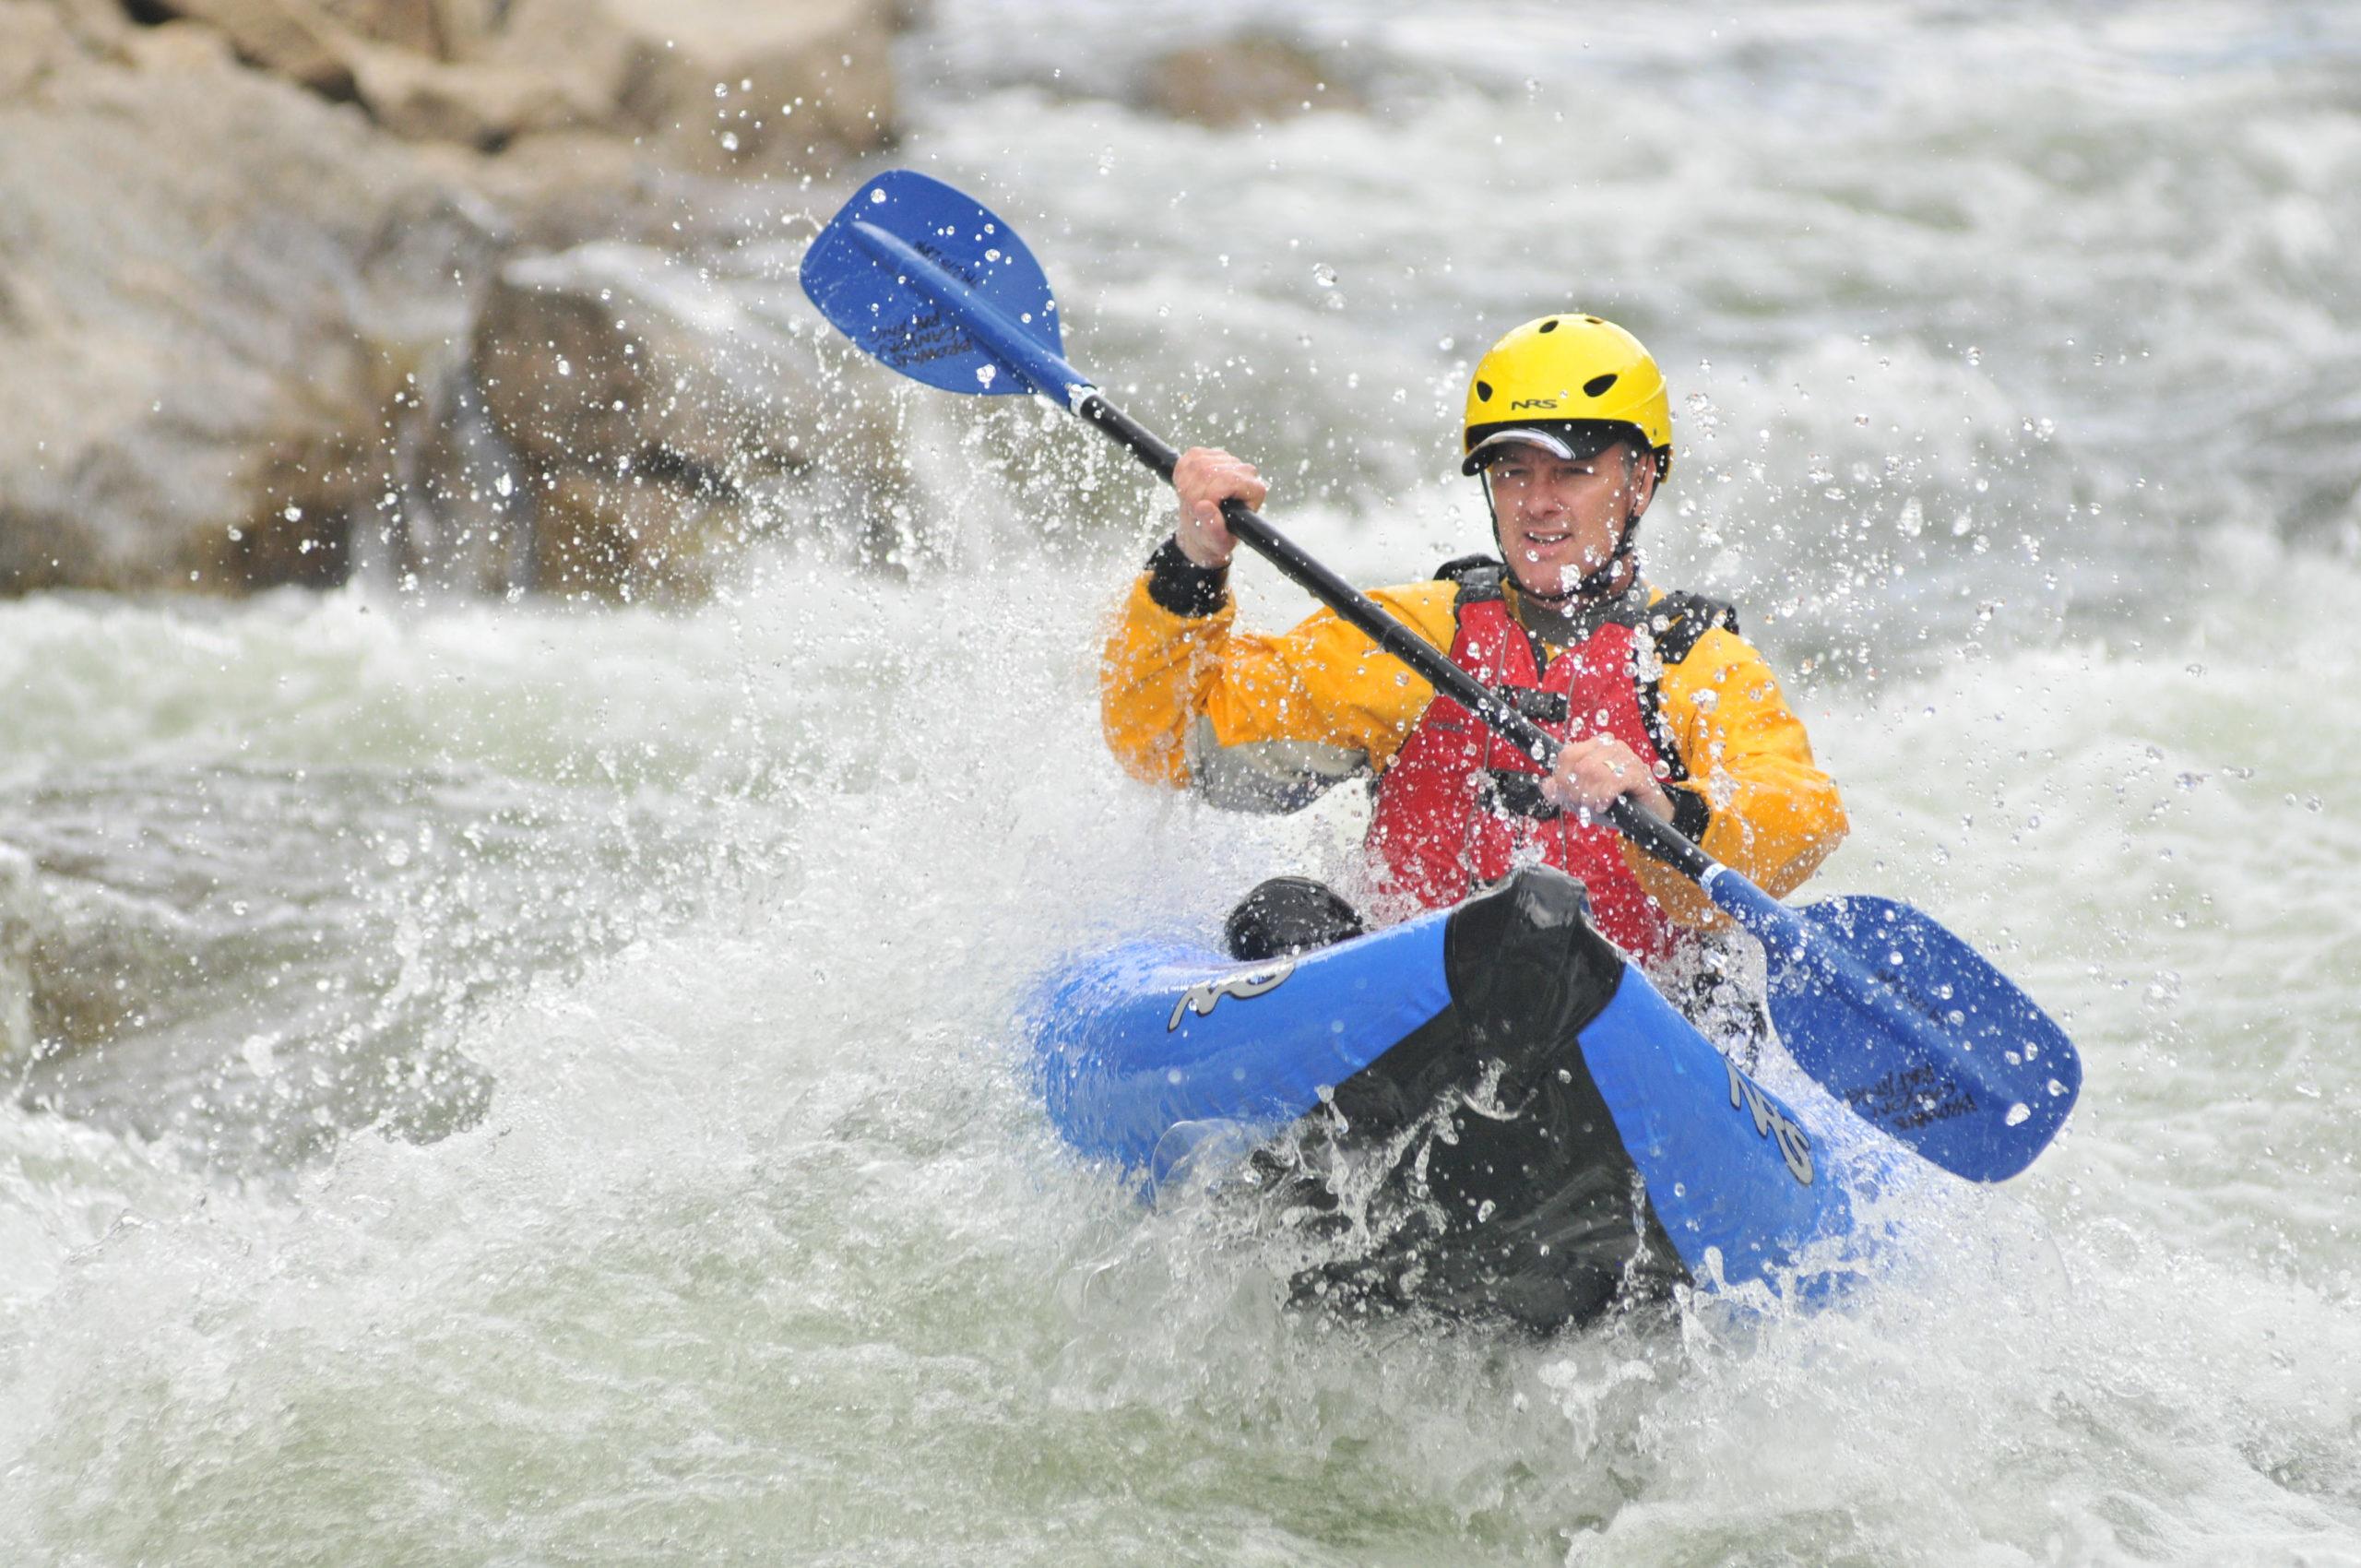 colorado kayaking buena vista co